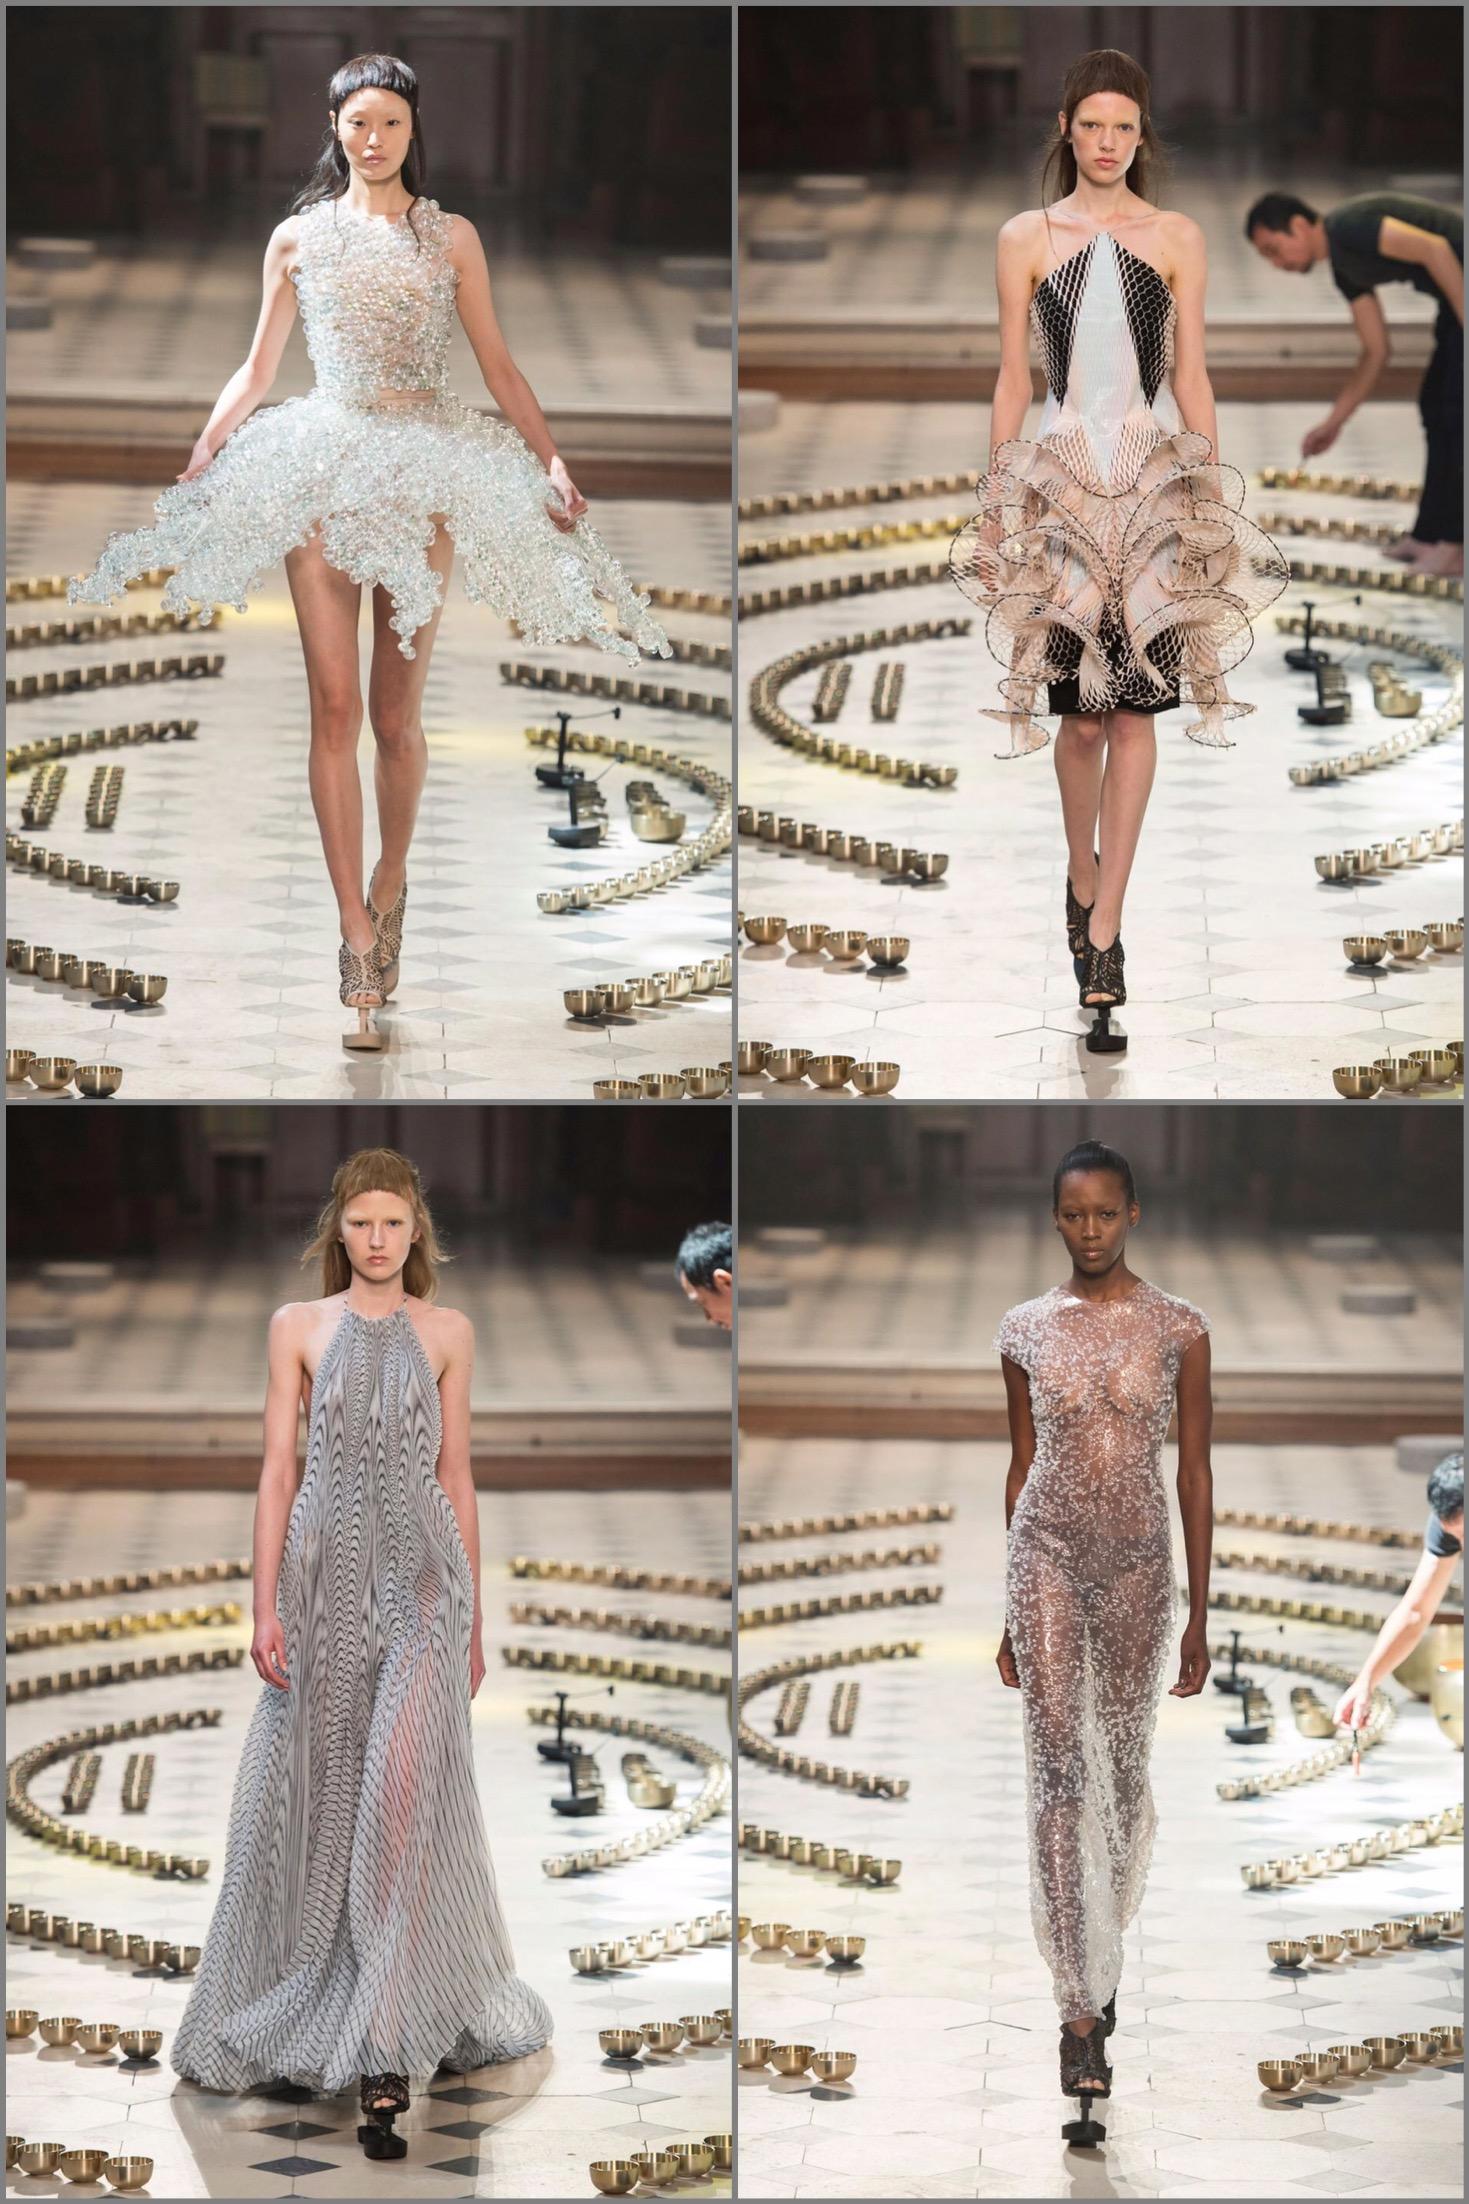 Paris Couture Week Fall Winter 2016-2017 - Iris Van Herpen